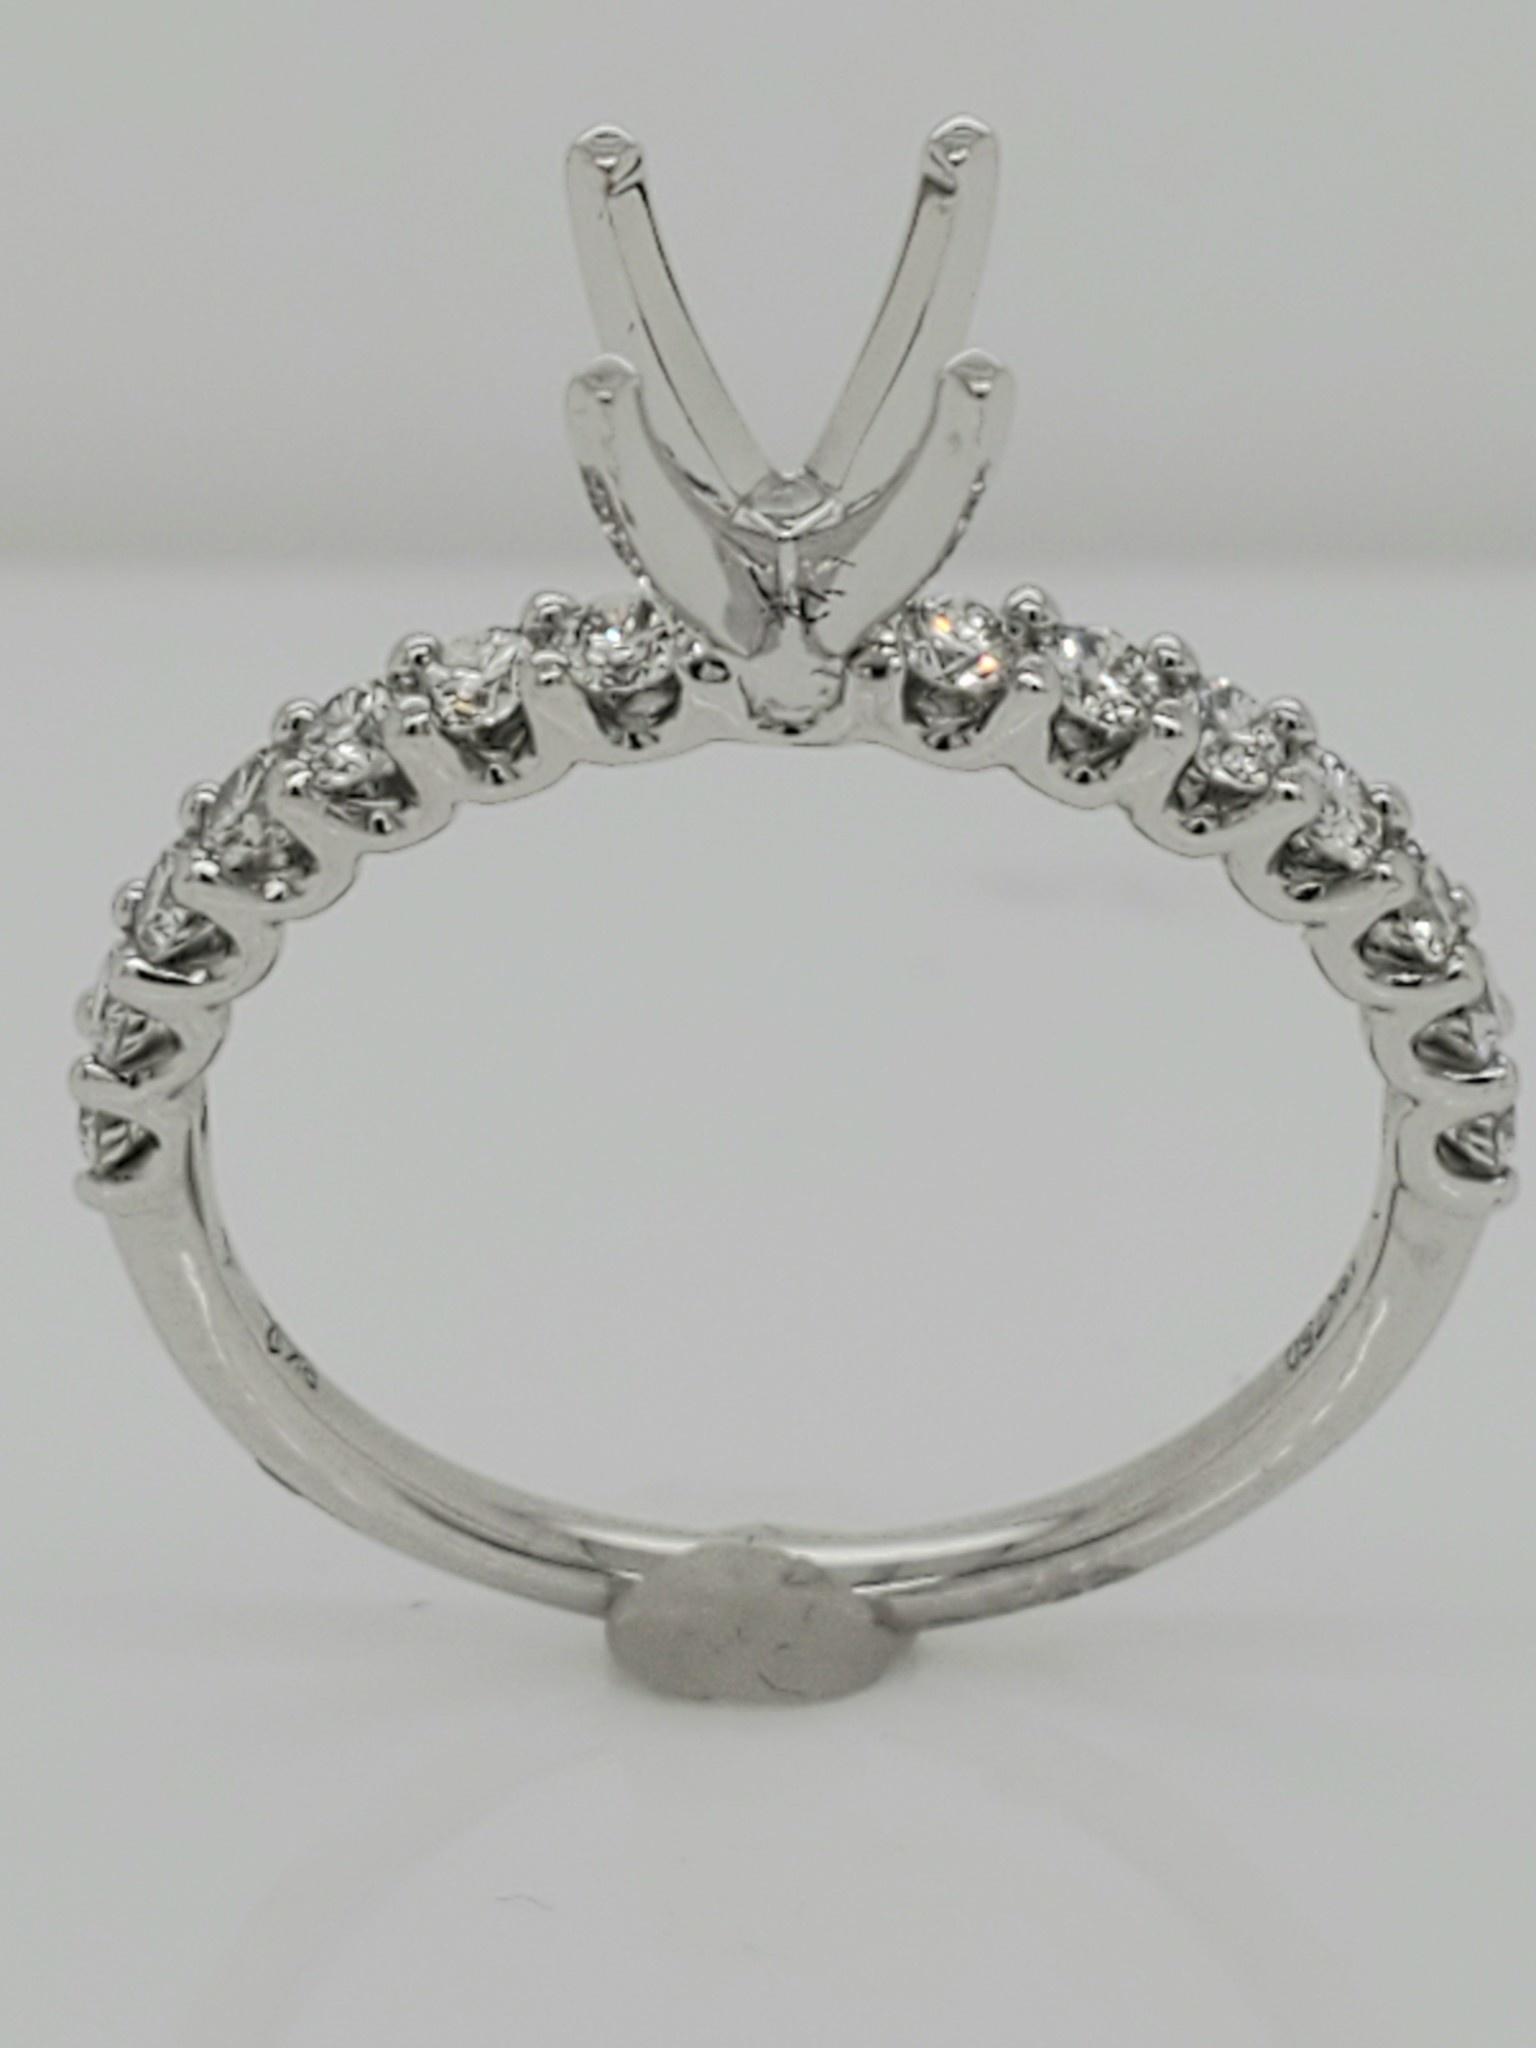 18KT White Gold Diamond Engagement Ring Setting 0.46 CTTW